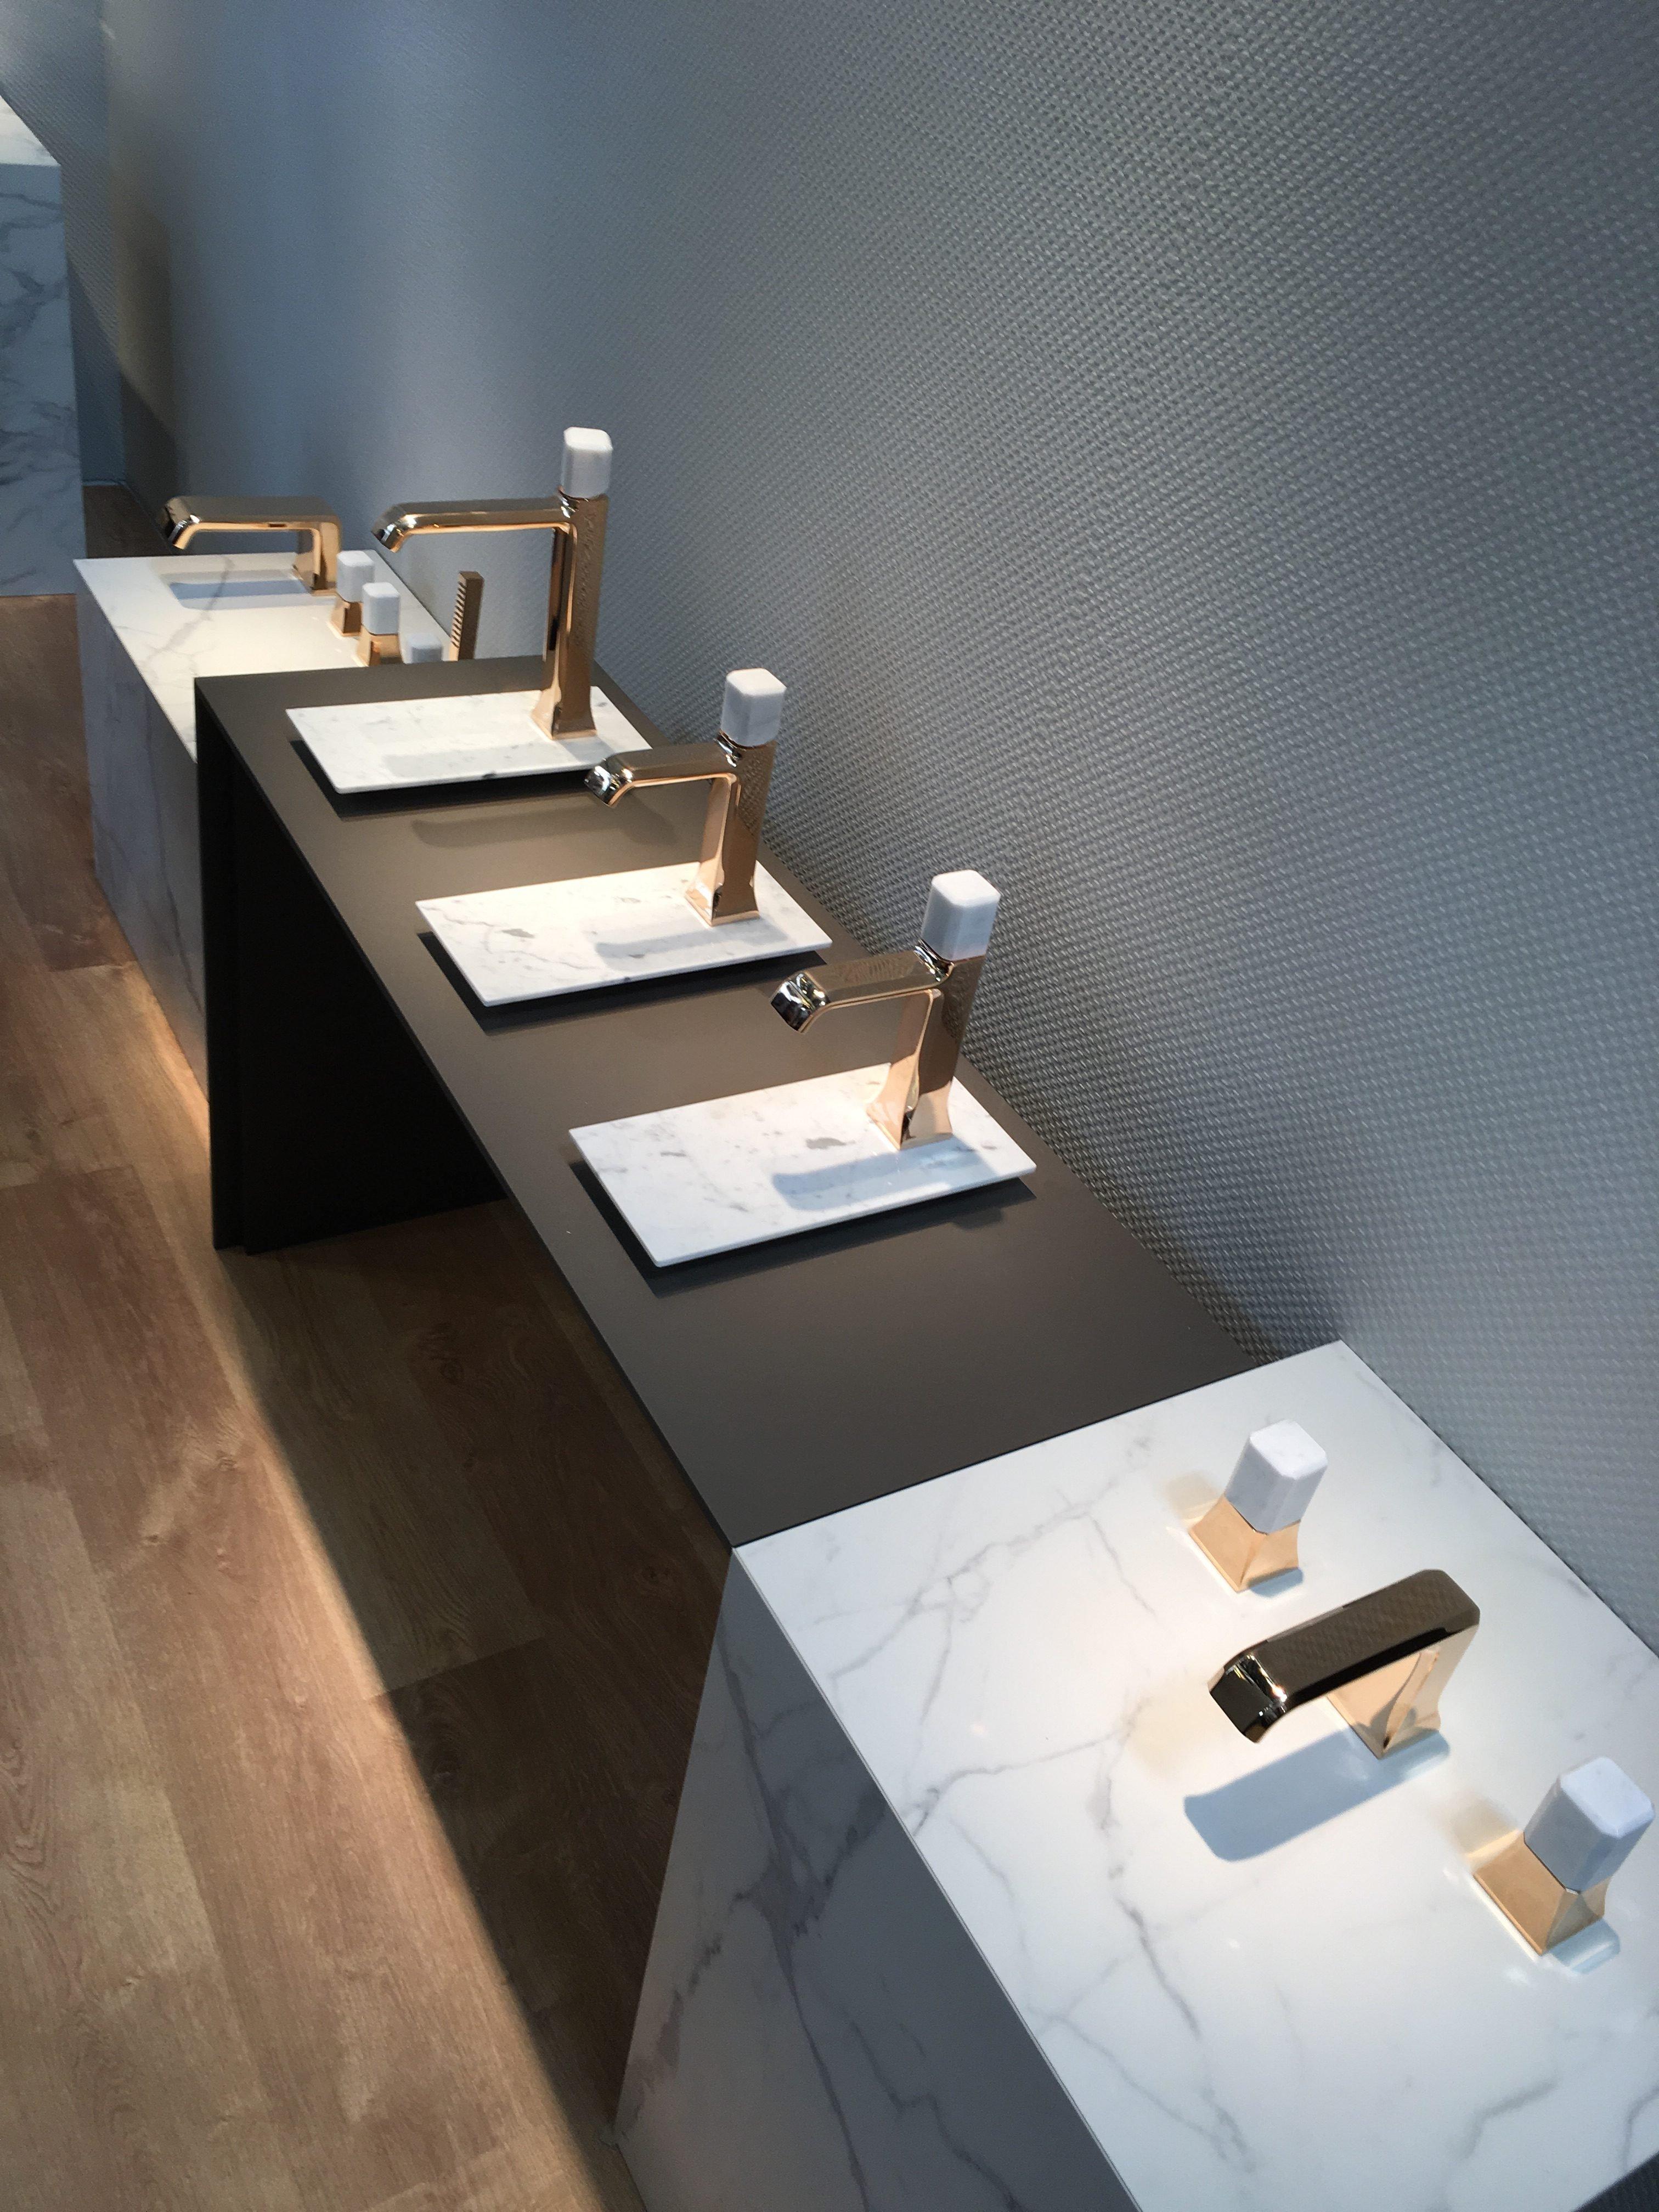 Cristina rubinetterie cersaie 2017 cose di casa for Nuove tendenze di casa